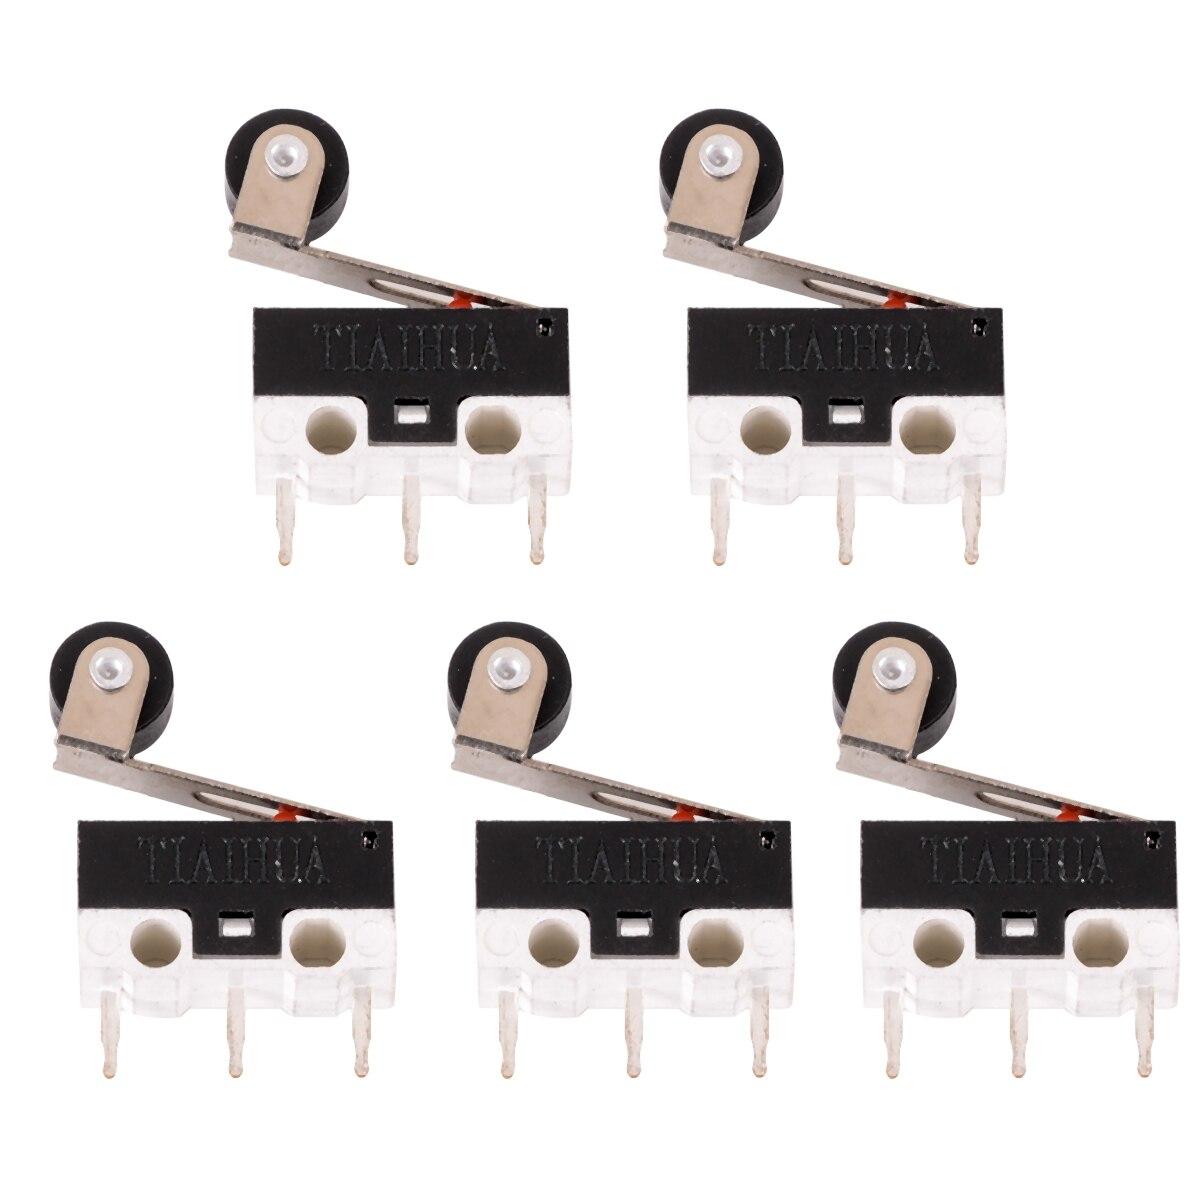 5 uds Micro interruptor Mini Interruptor de Límite Micro palanca con rodillo de bisagra brazo microinterruptor SPDT Sub miniatura 6,5mm